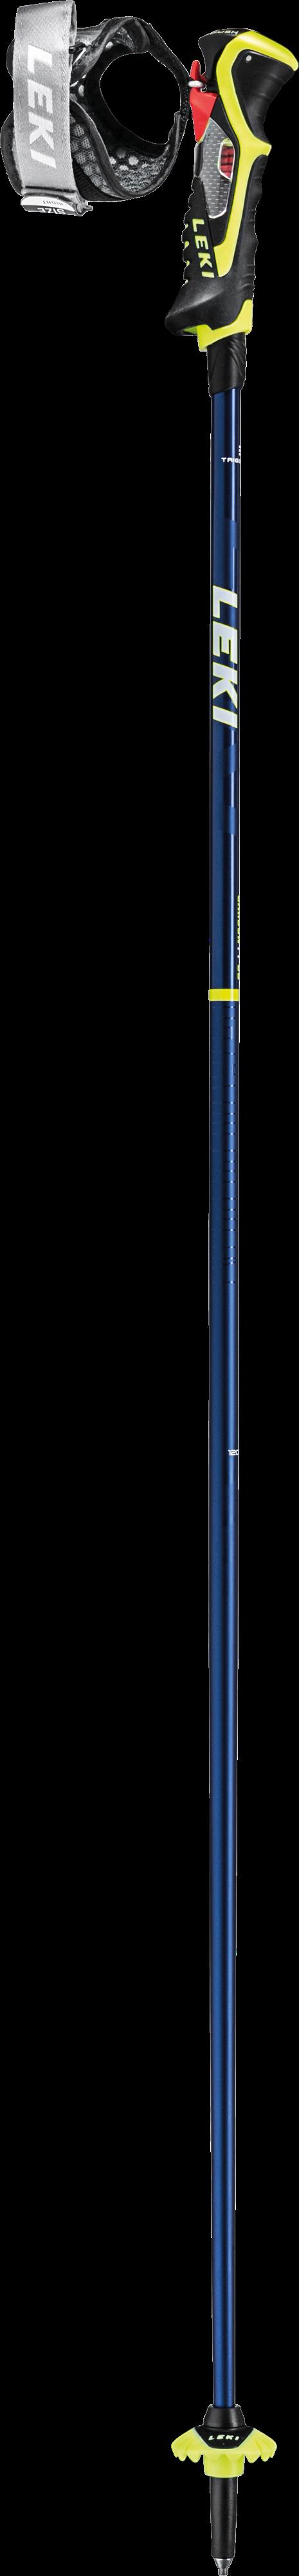 Leki Skialpové hole Carbon 14 3D 2020_2021